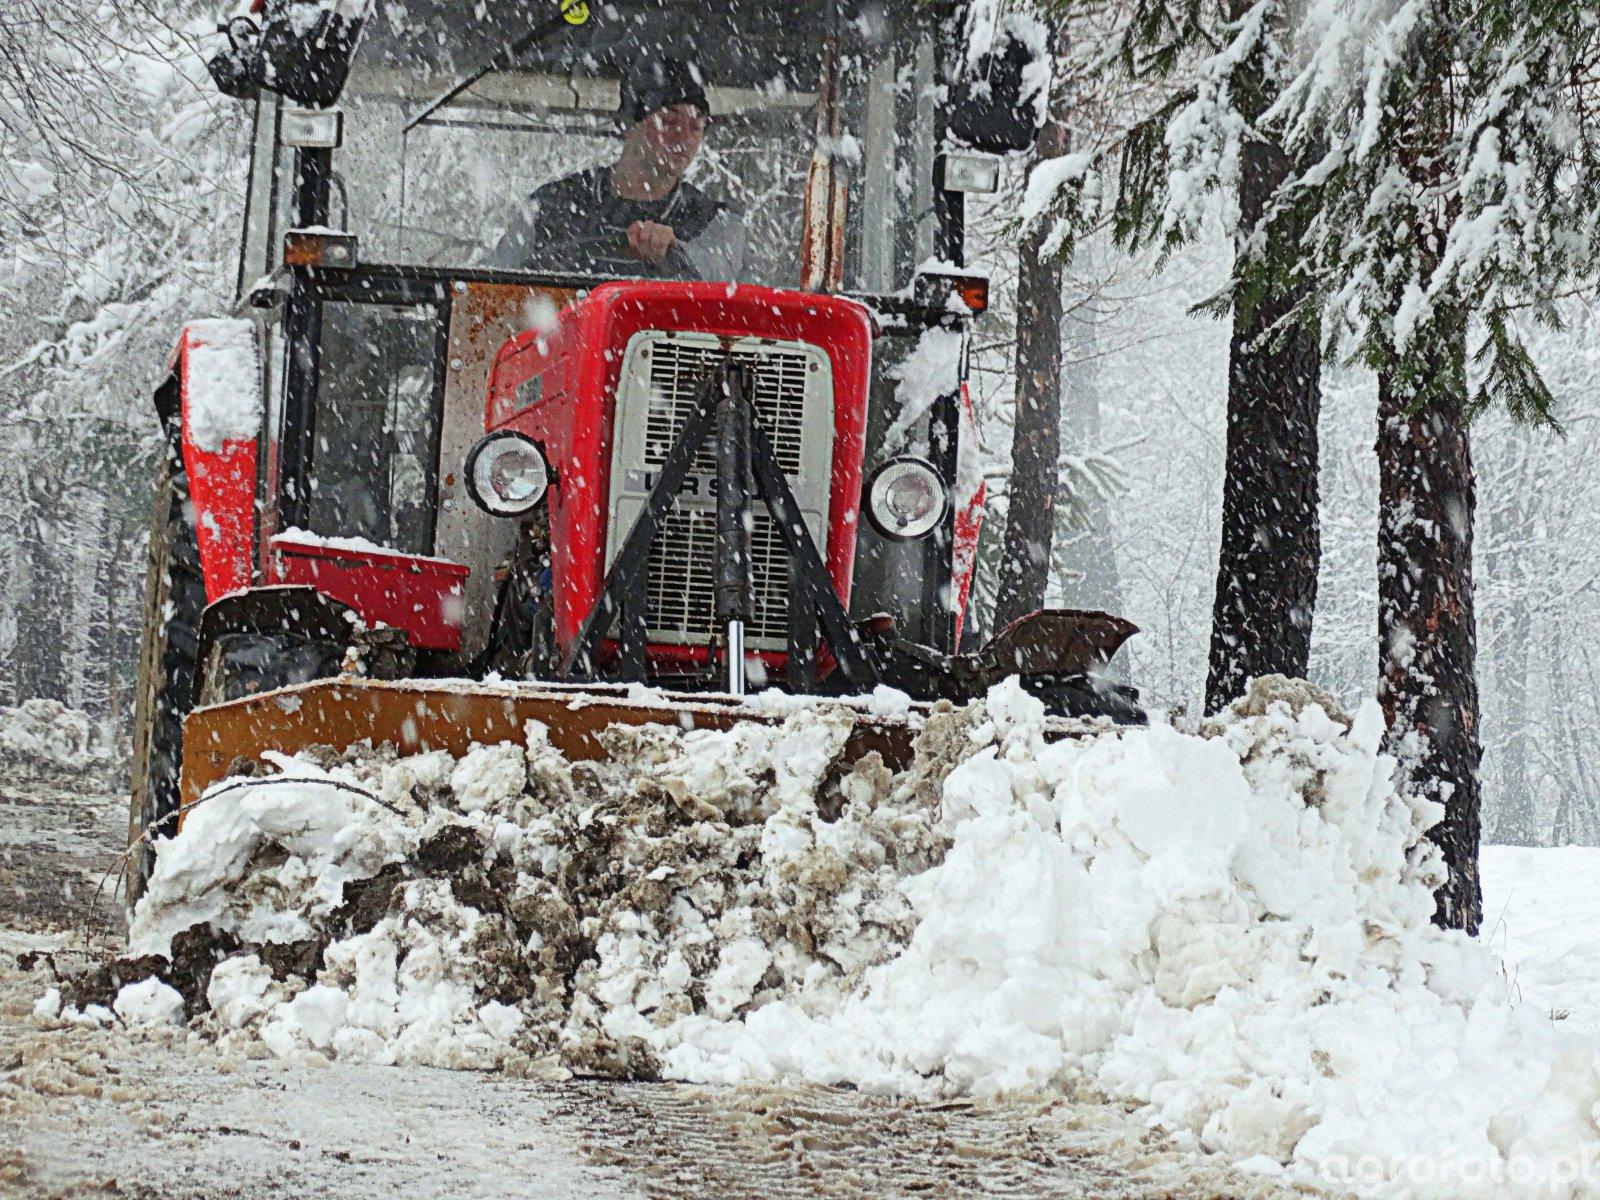 Młodzieńczy Fotografia ciągnik Ursus C-360 & Pług do śniegu #714243 - Galeria FB01